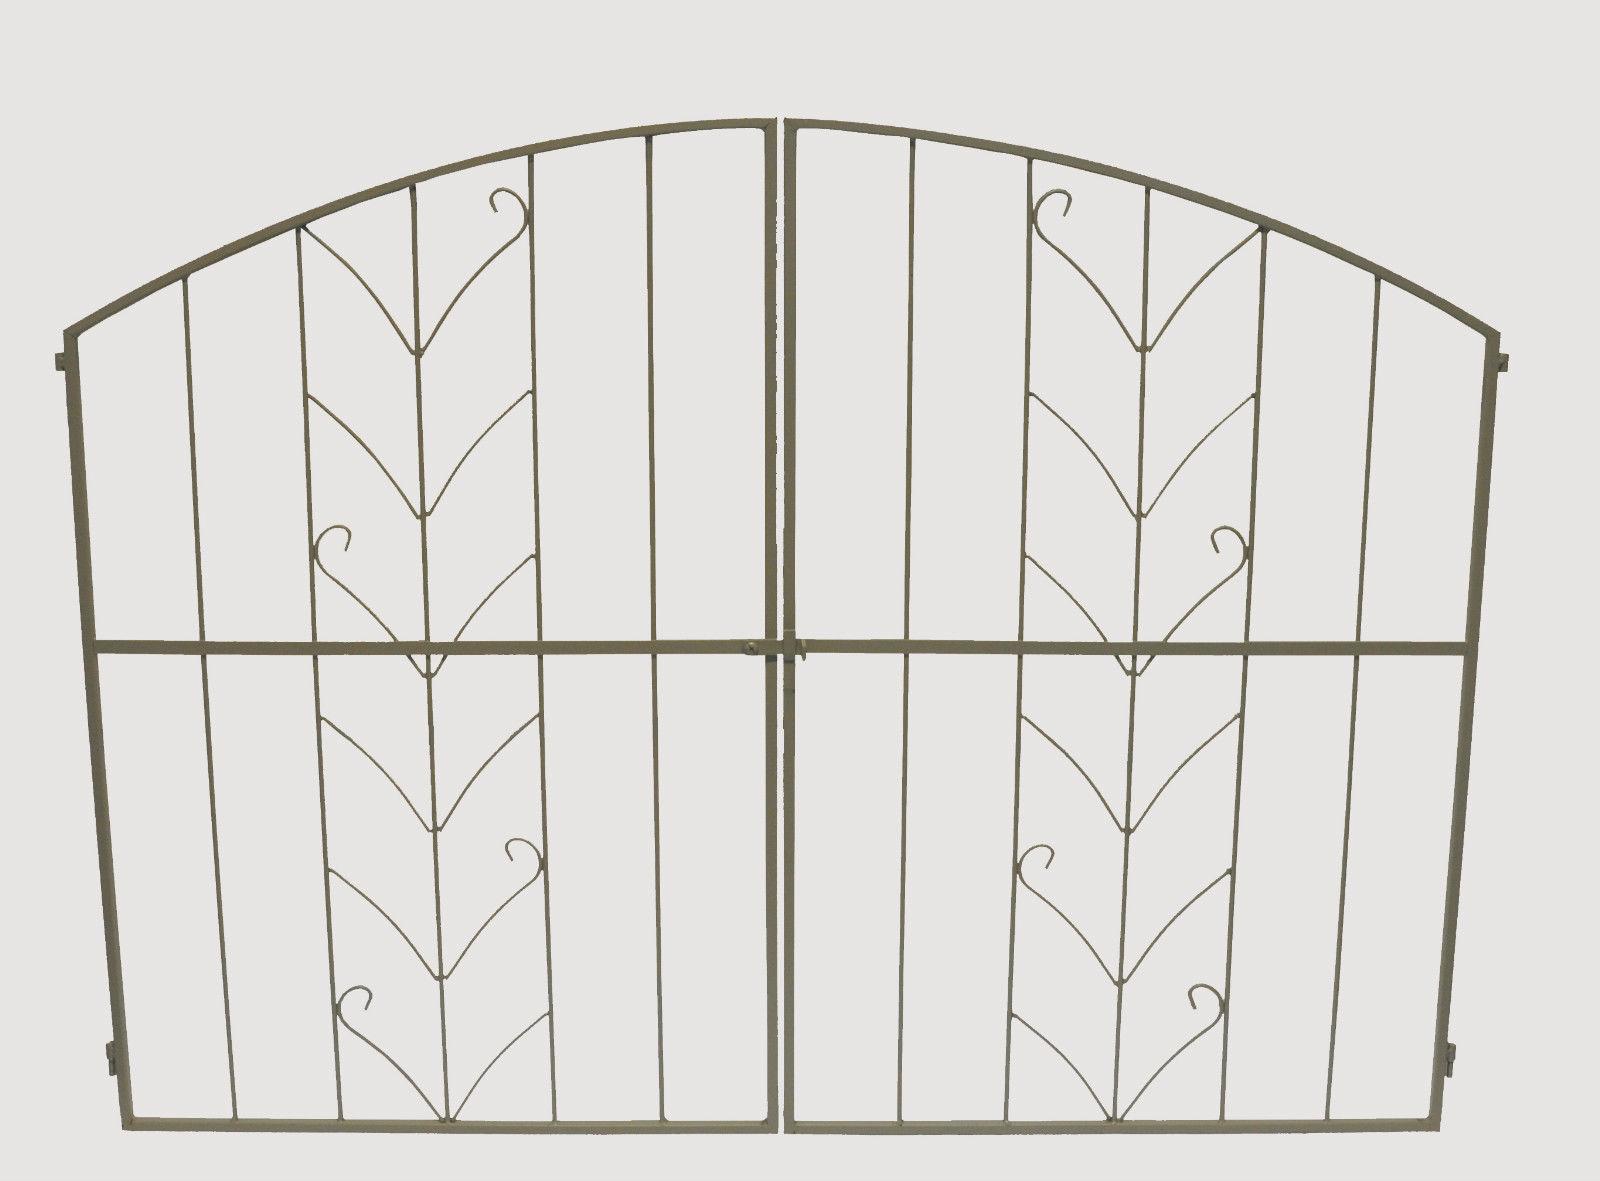 rosenbogen mit tor laubengang rankhilfe pergola juno. Black Bedroom Furniture Sets. Home Design Ideas